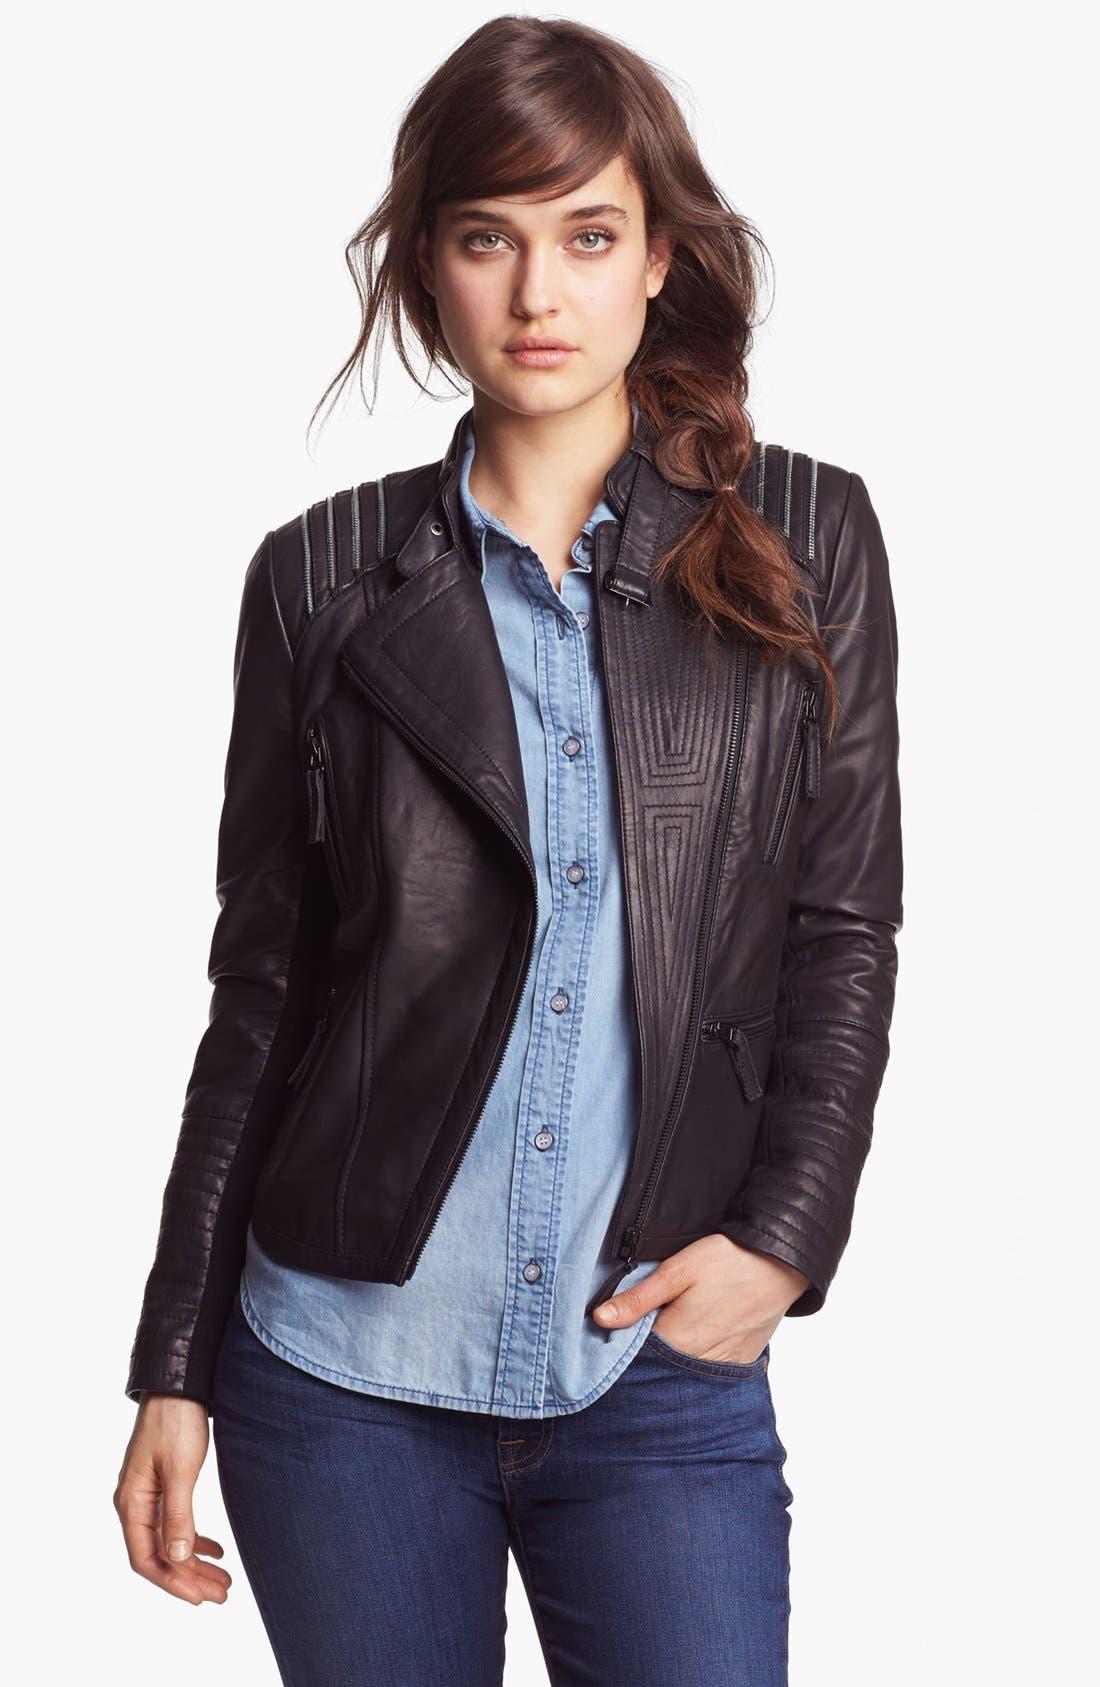 BERNARDO, Asymmetrical Leather Moto Jacket, Main thumbnail 1, color, 001